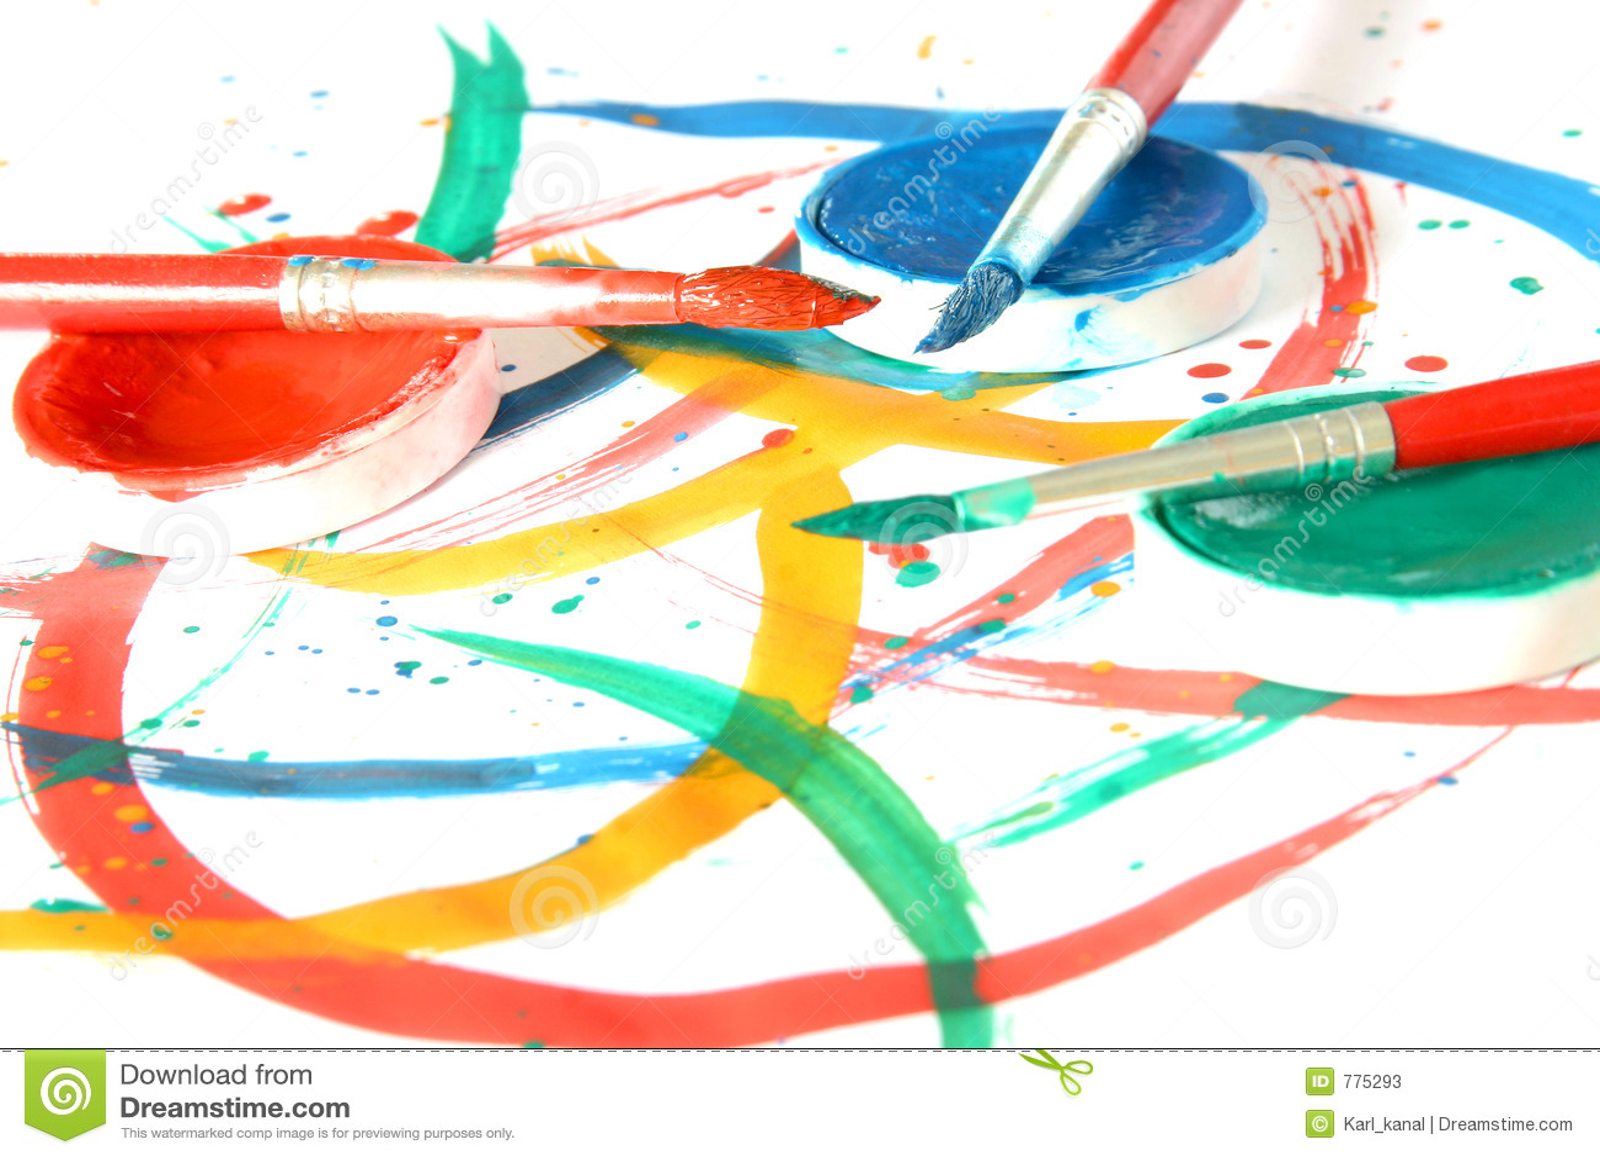 Kreativ - Pinsel u. Farbe stock abbildung. Illustration von ...